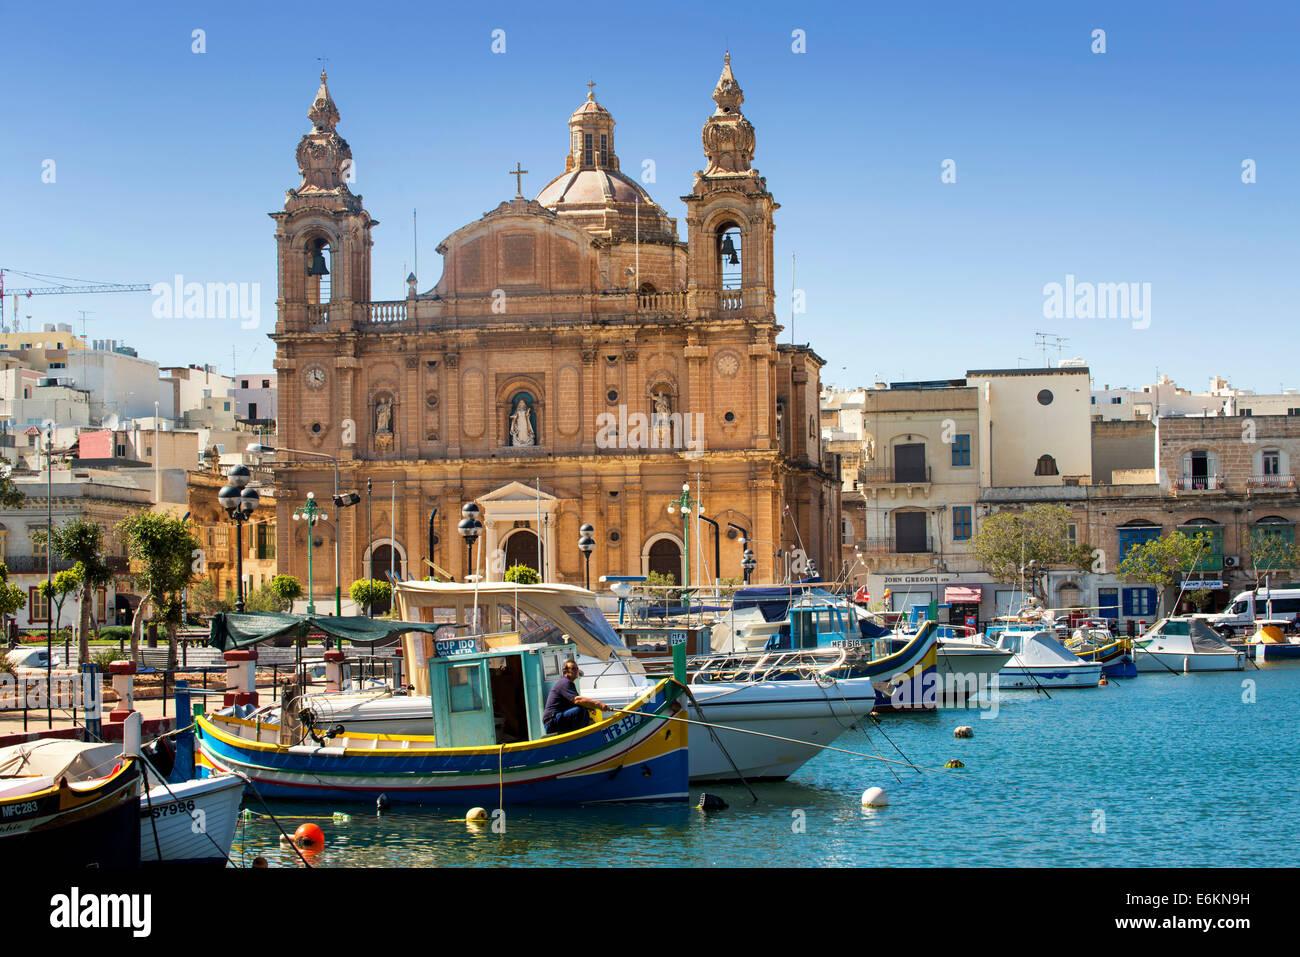 Church of Sultana tal-paci, St Joseph's, Msida Creek, Valletta, Malta - Stock Image